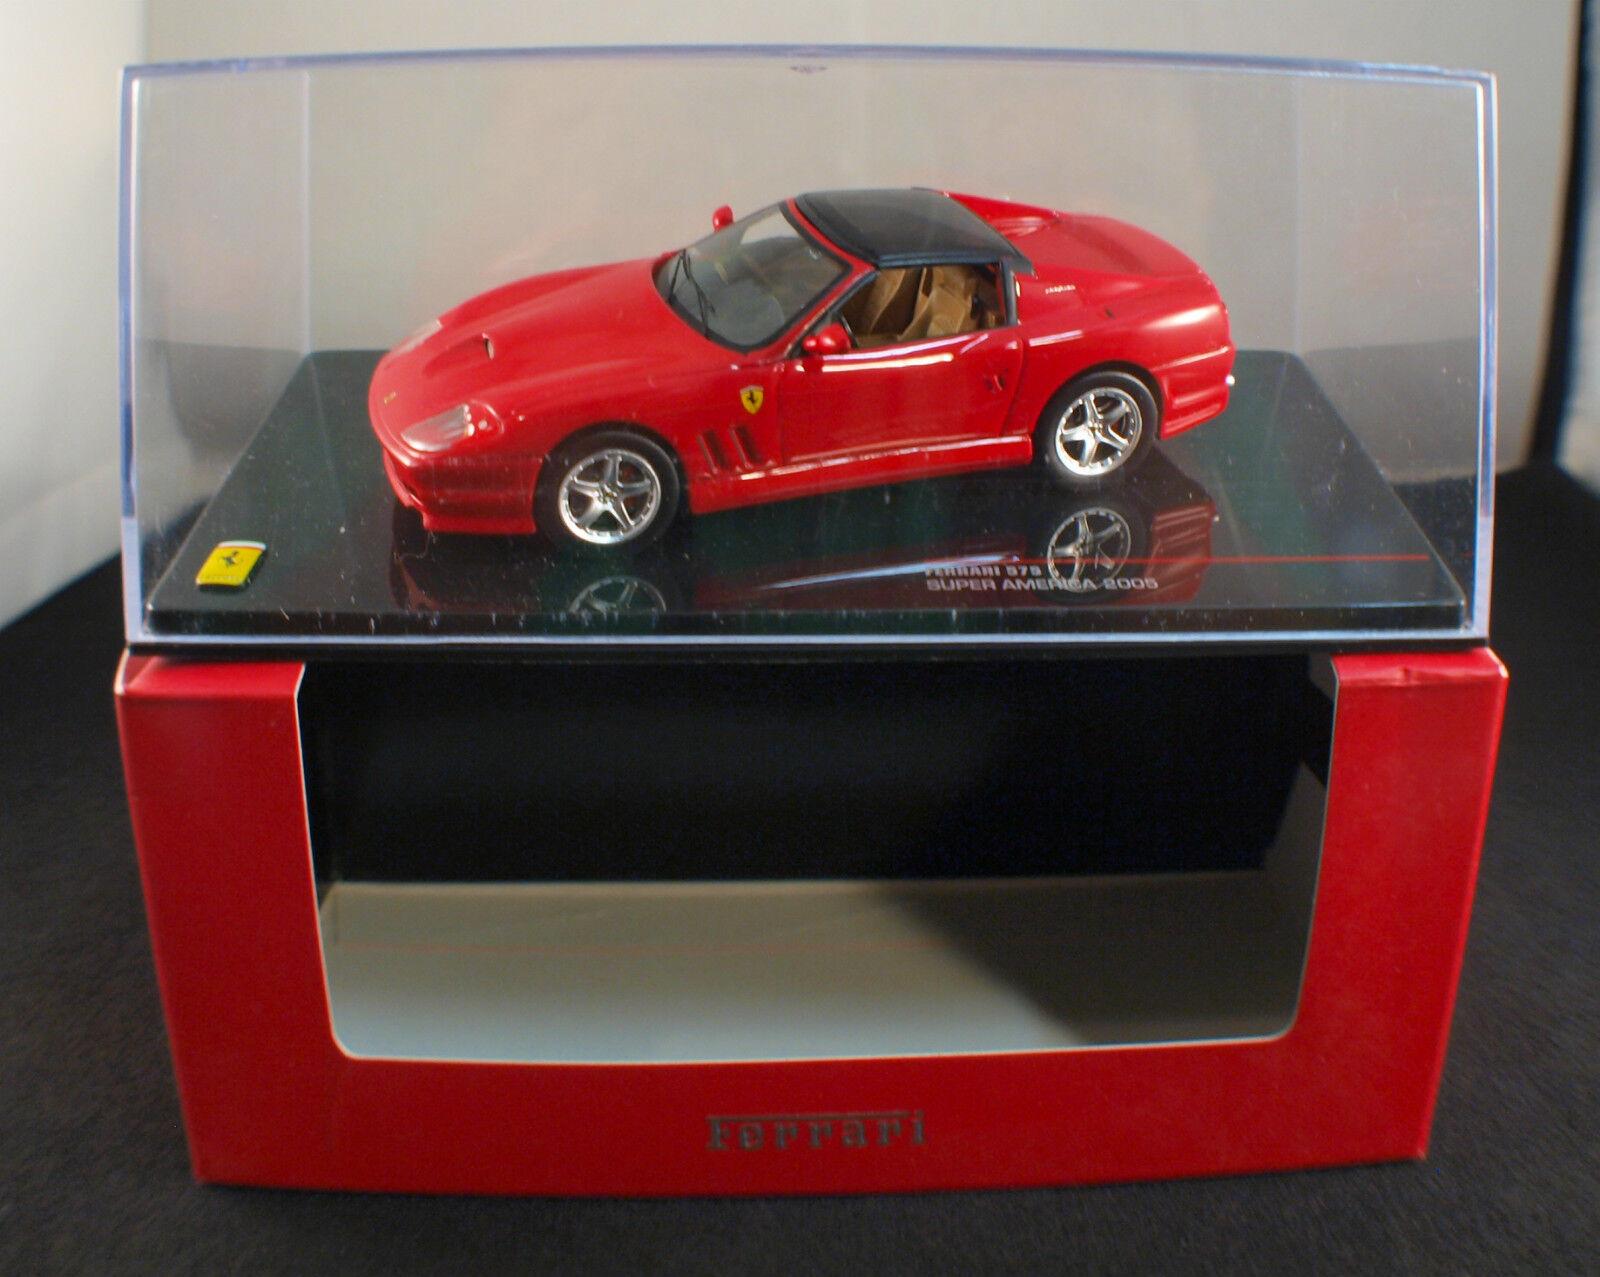 IXO ◊FER026 Ferrari 575 Super America 2005 rouge ◊1 43◊ boxed en boite ◊ RARE